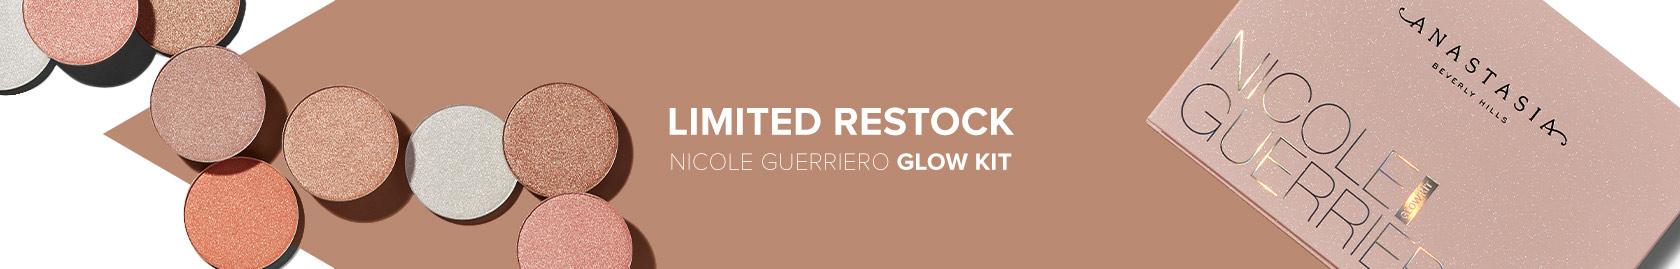 Nicole Guerriero Glow Kit - Limited Restock